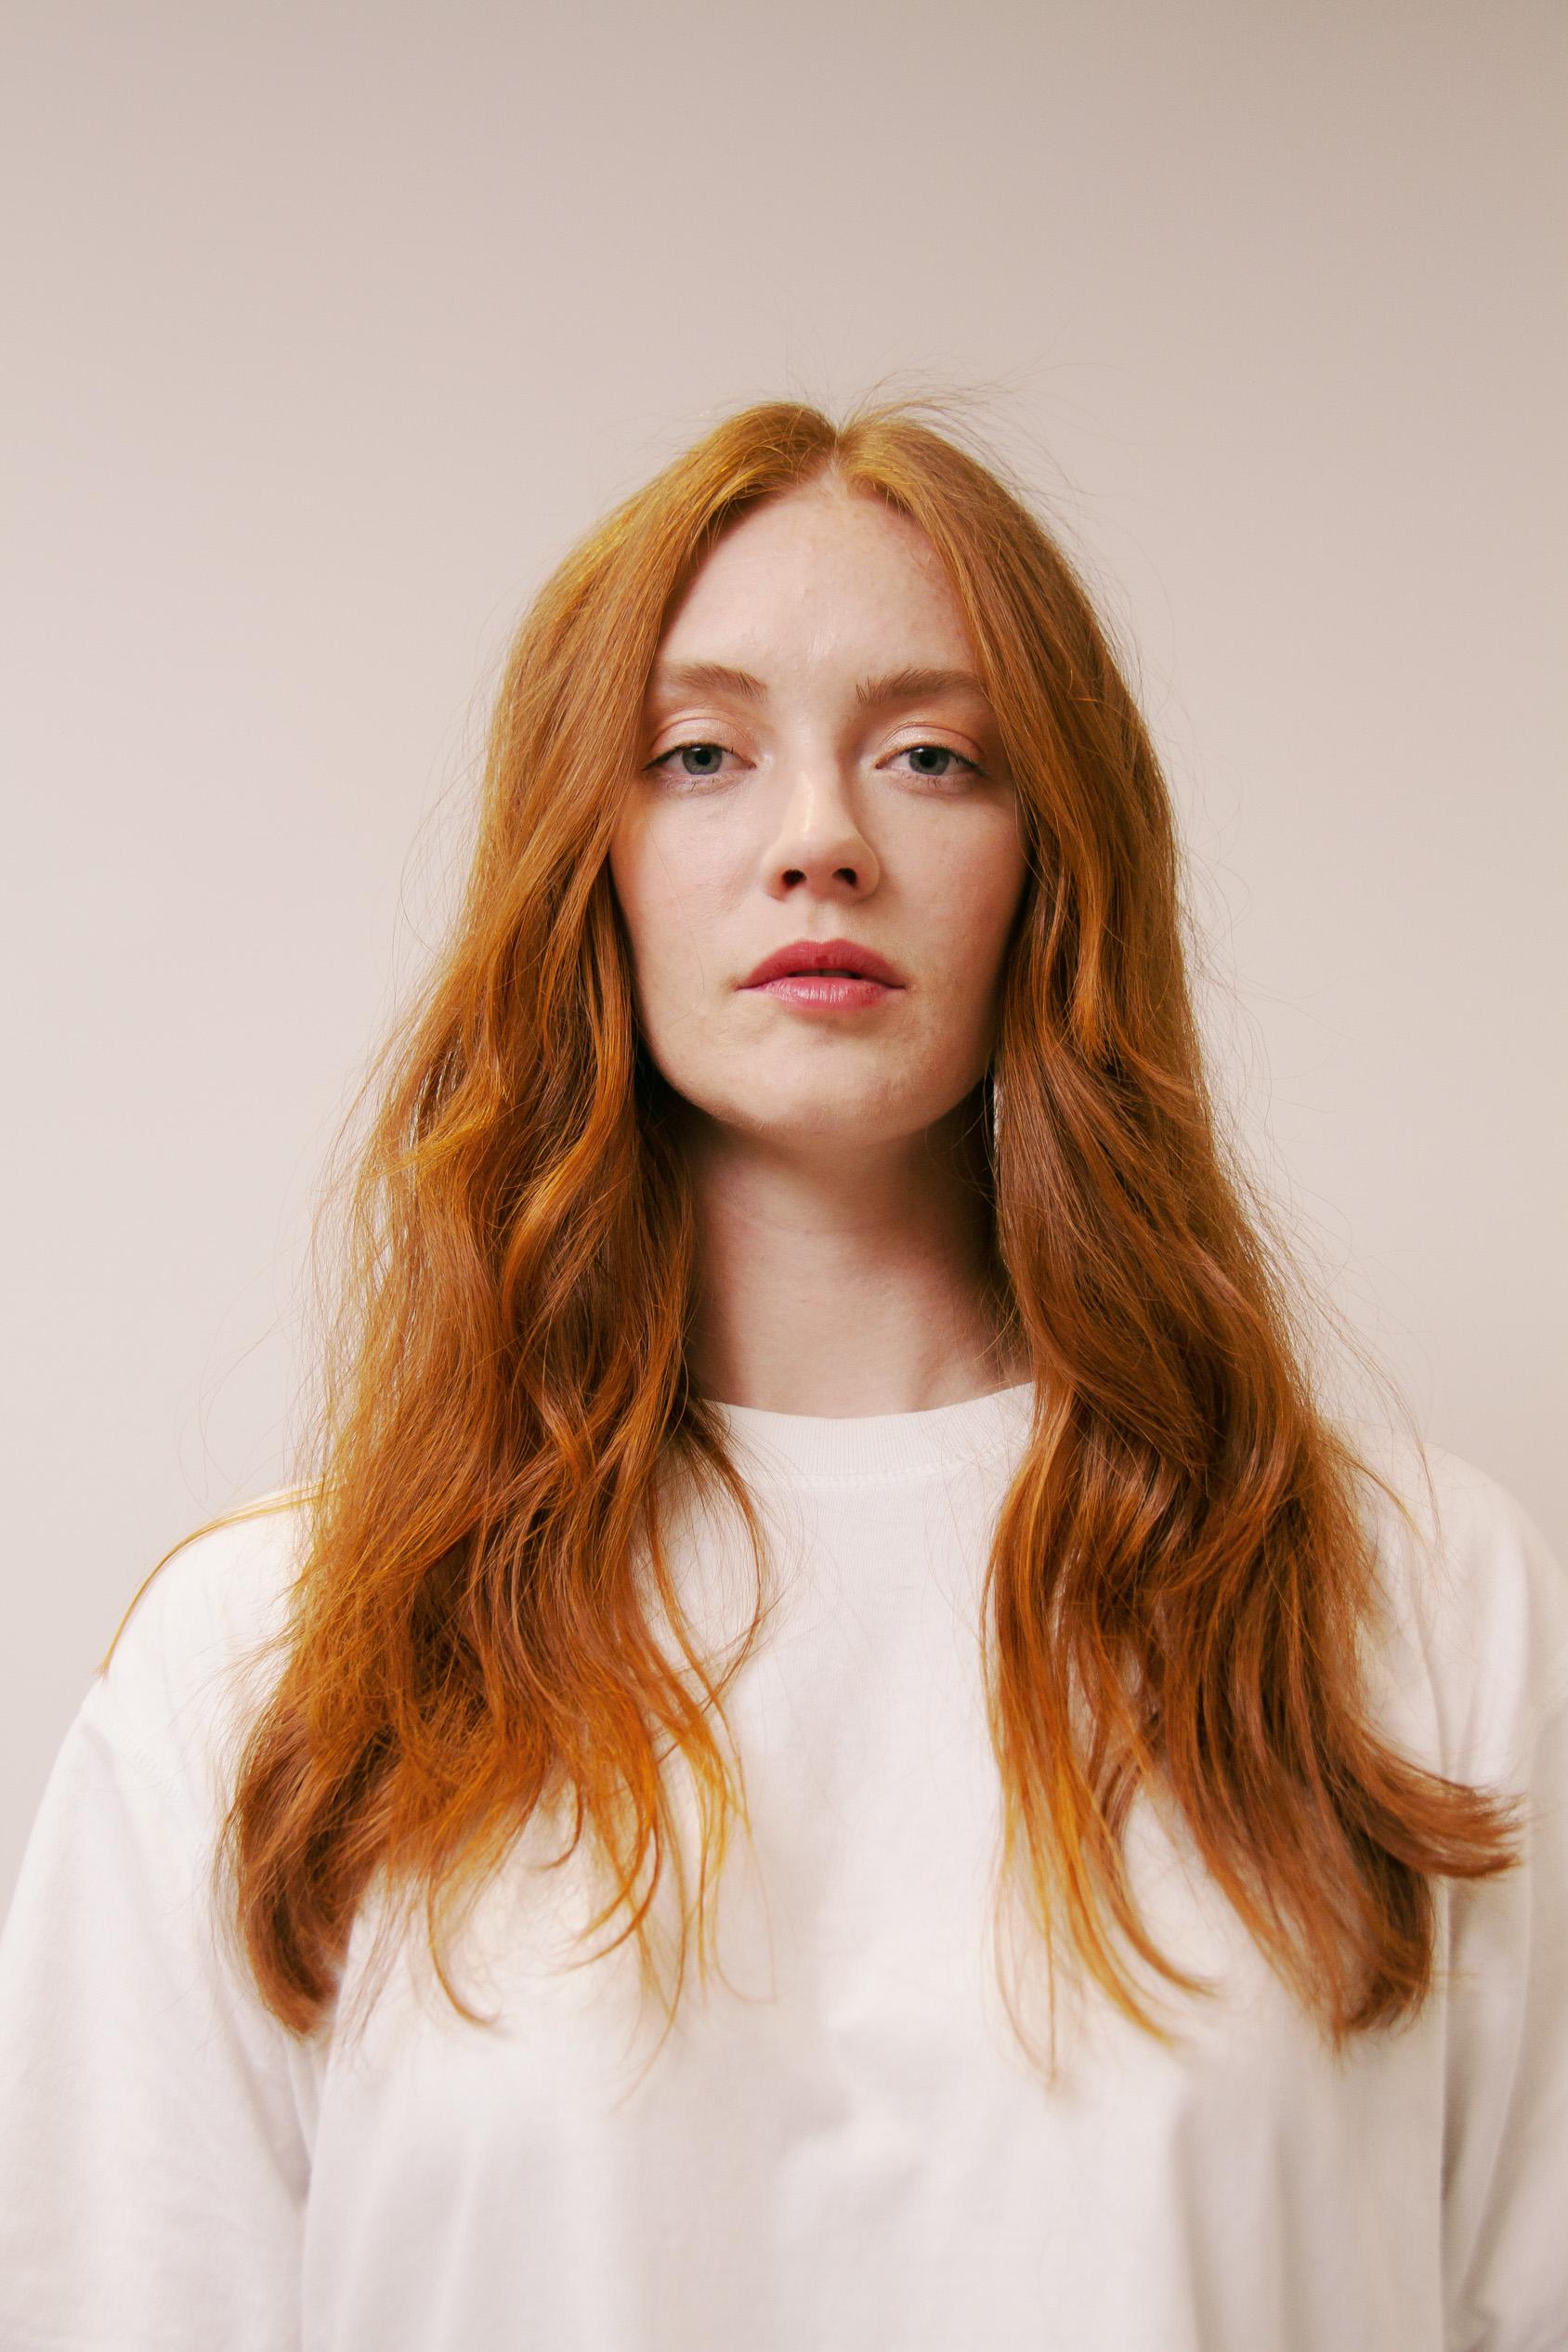 Pride Portraits: Grace Shush reveals how hair equals self expression - Josh  Wood Community